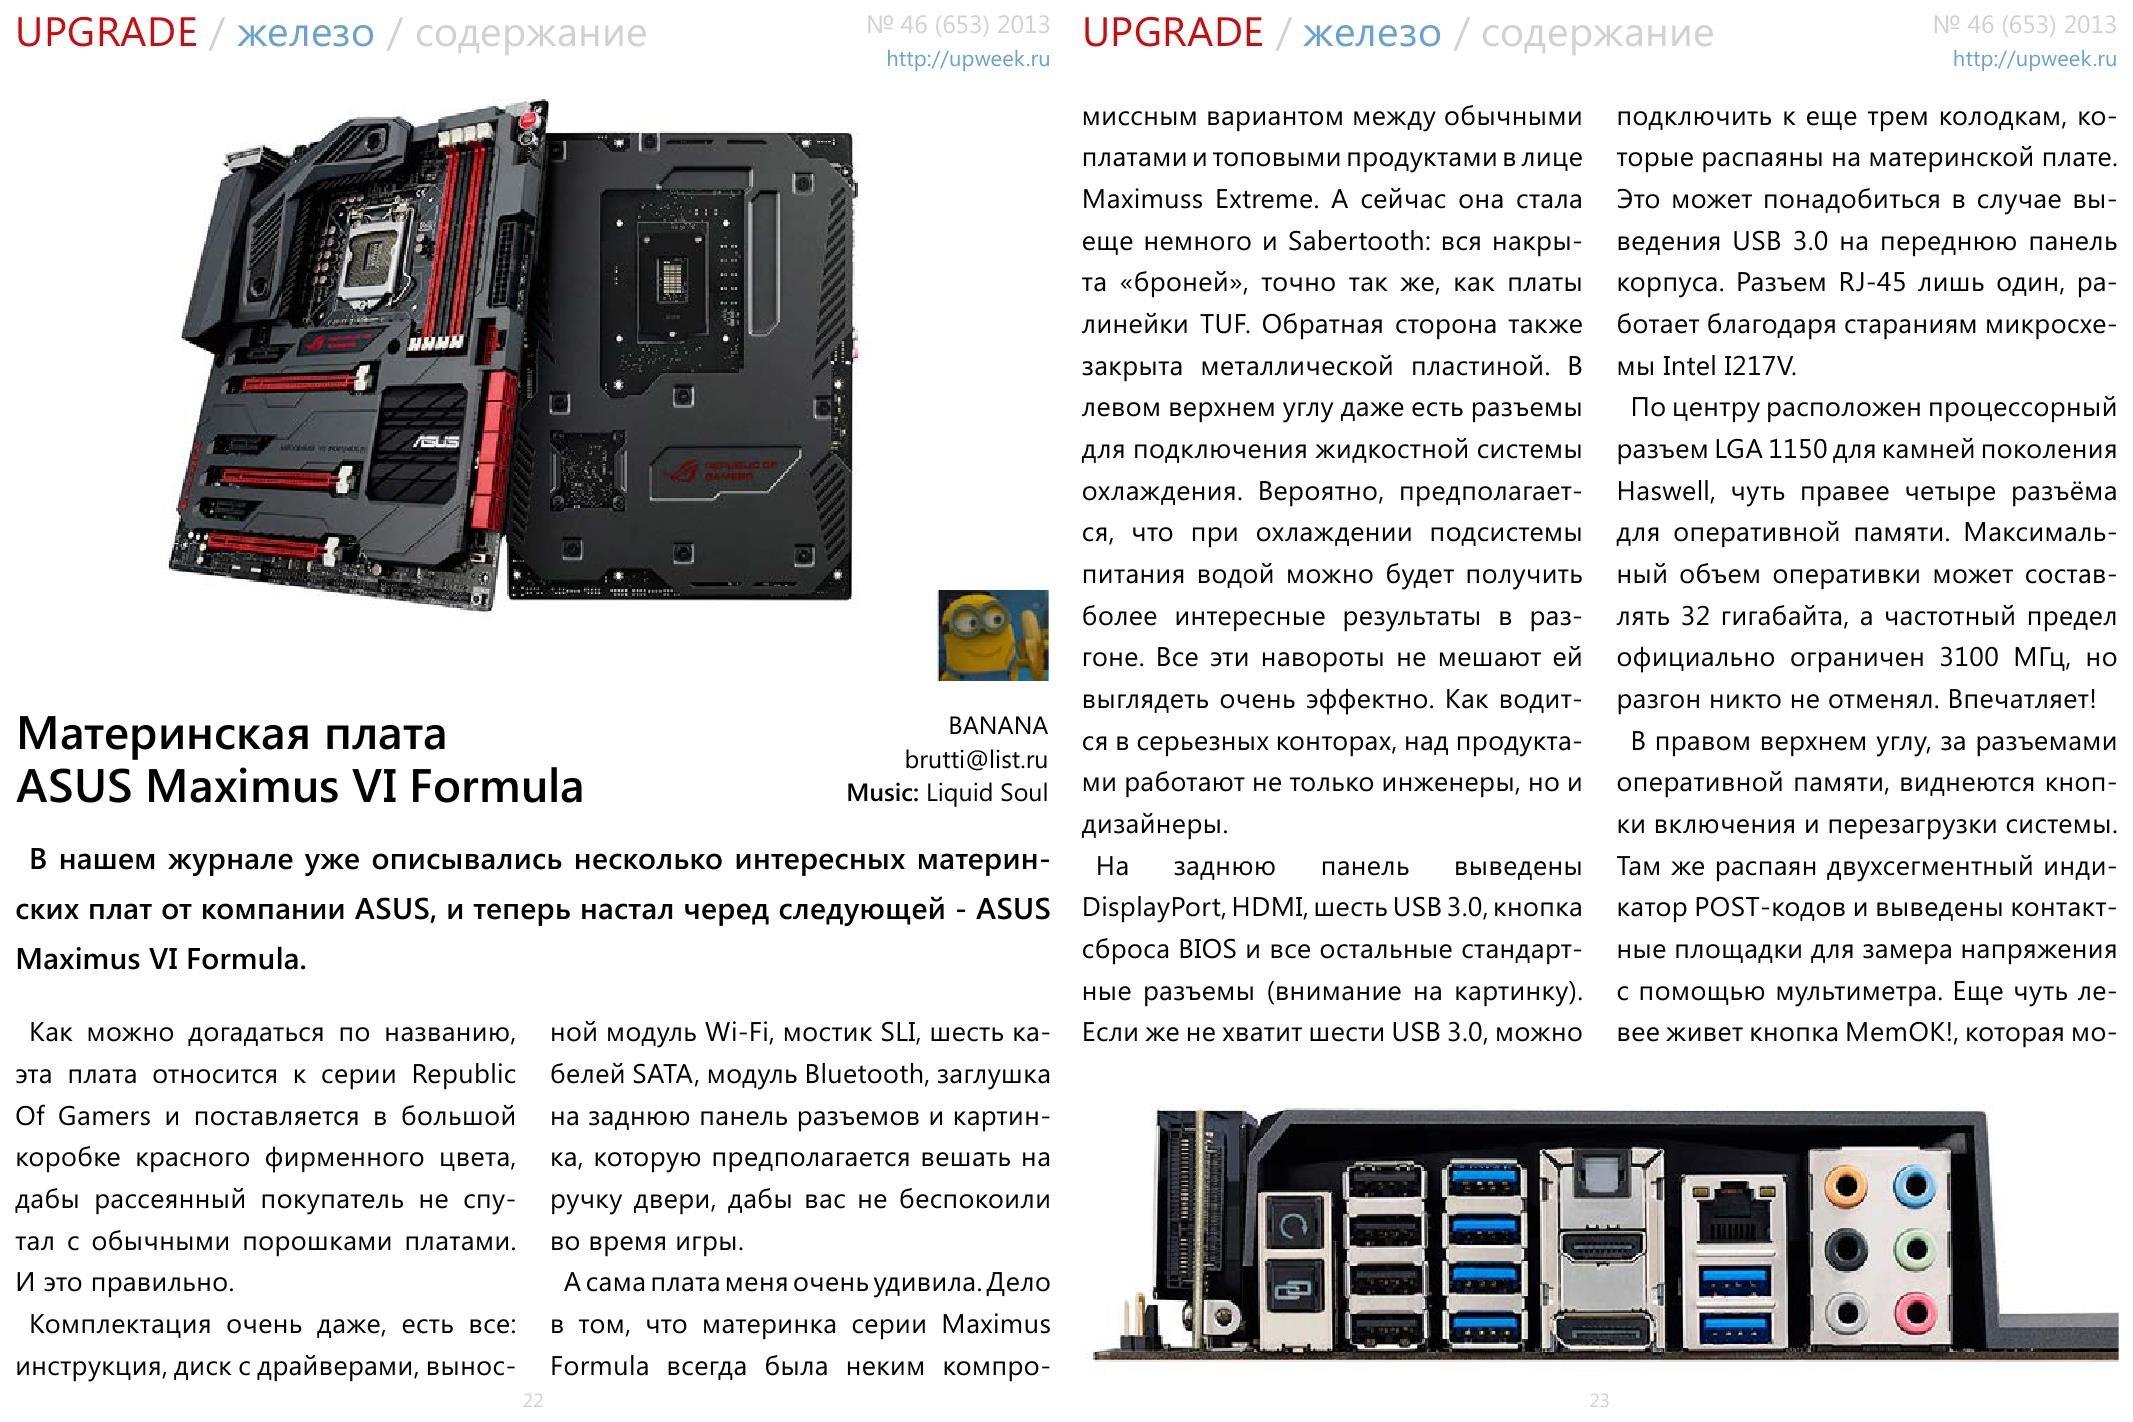 UPgrade №46 (653) (декабрь 2013 / Россия) PDF